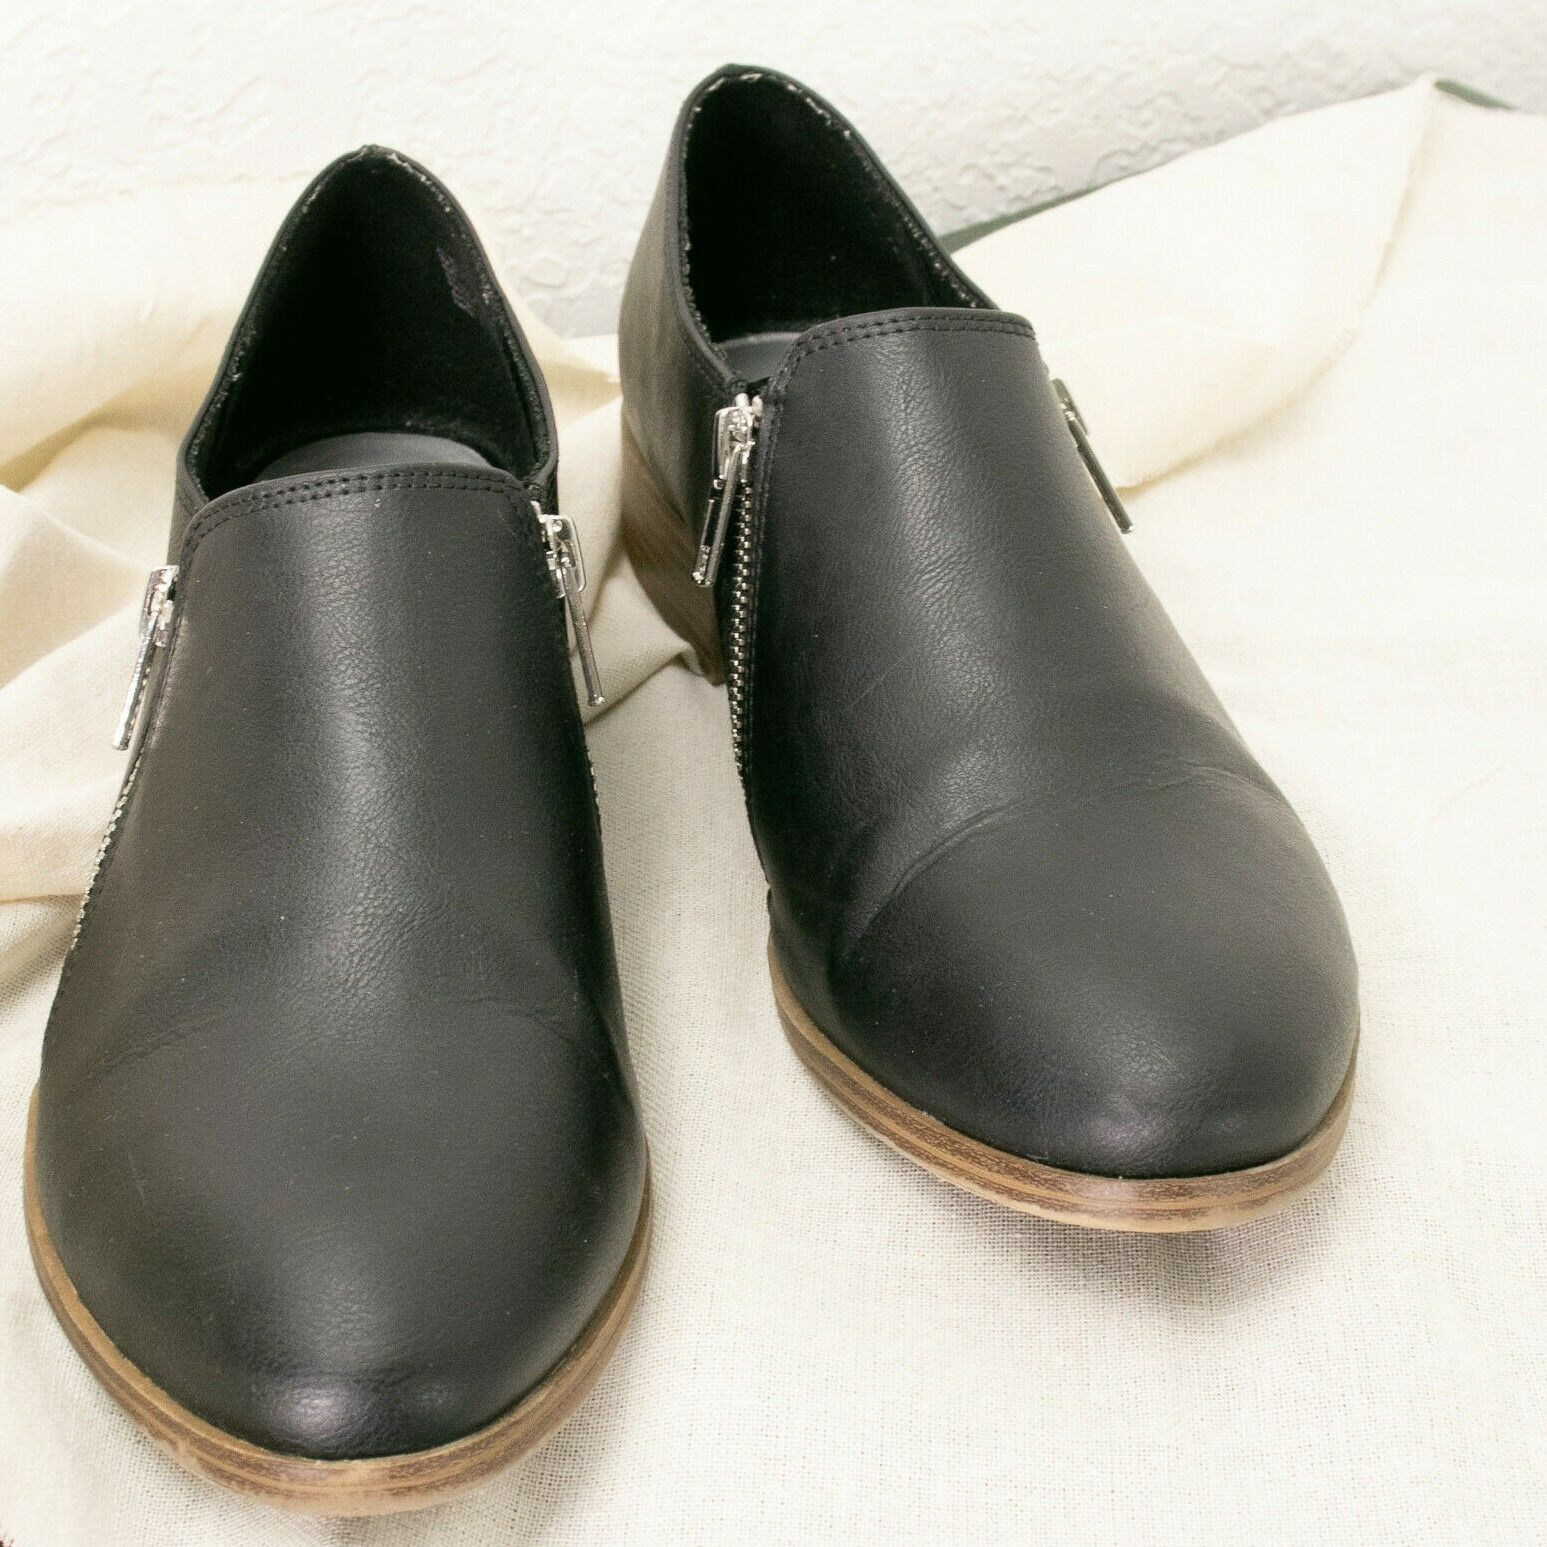 American Eagle Outfitters Dara Duel Zip Cheville Bootie Chaussure | Noir Sz 10 W EUC